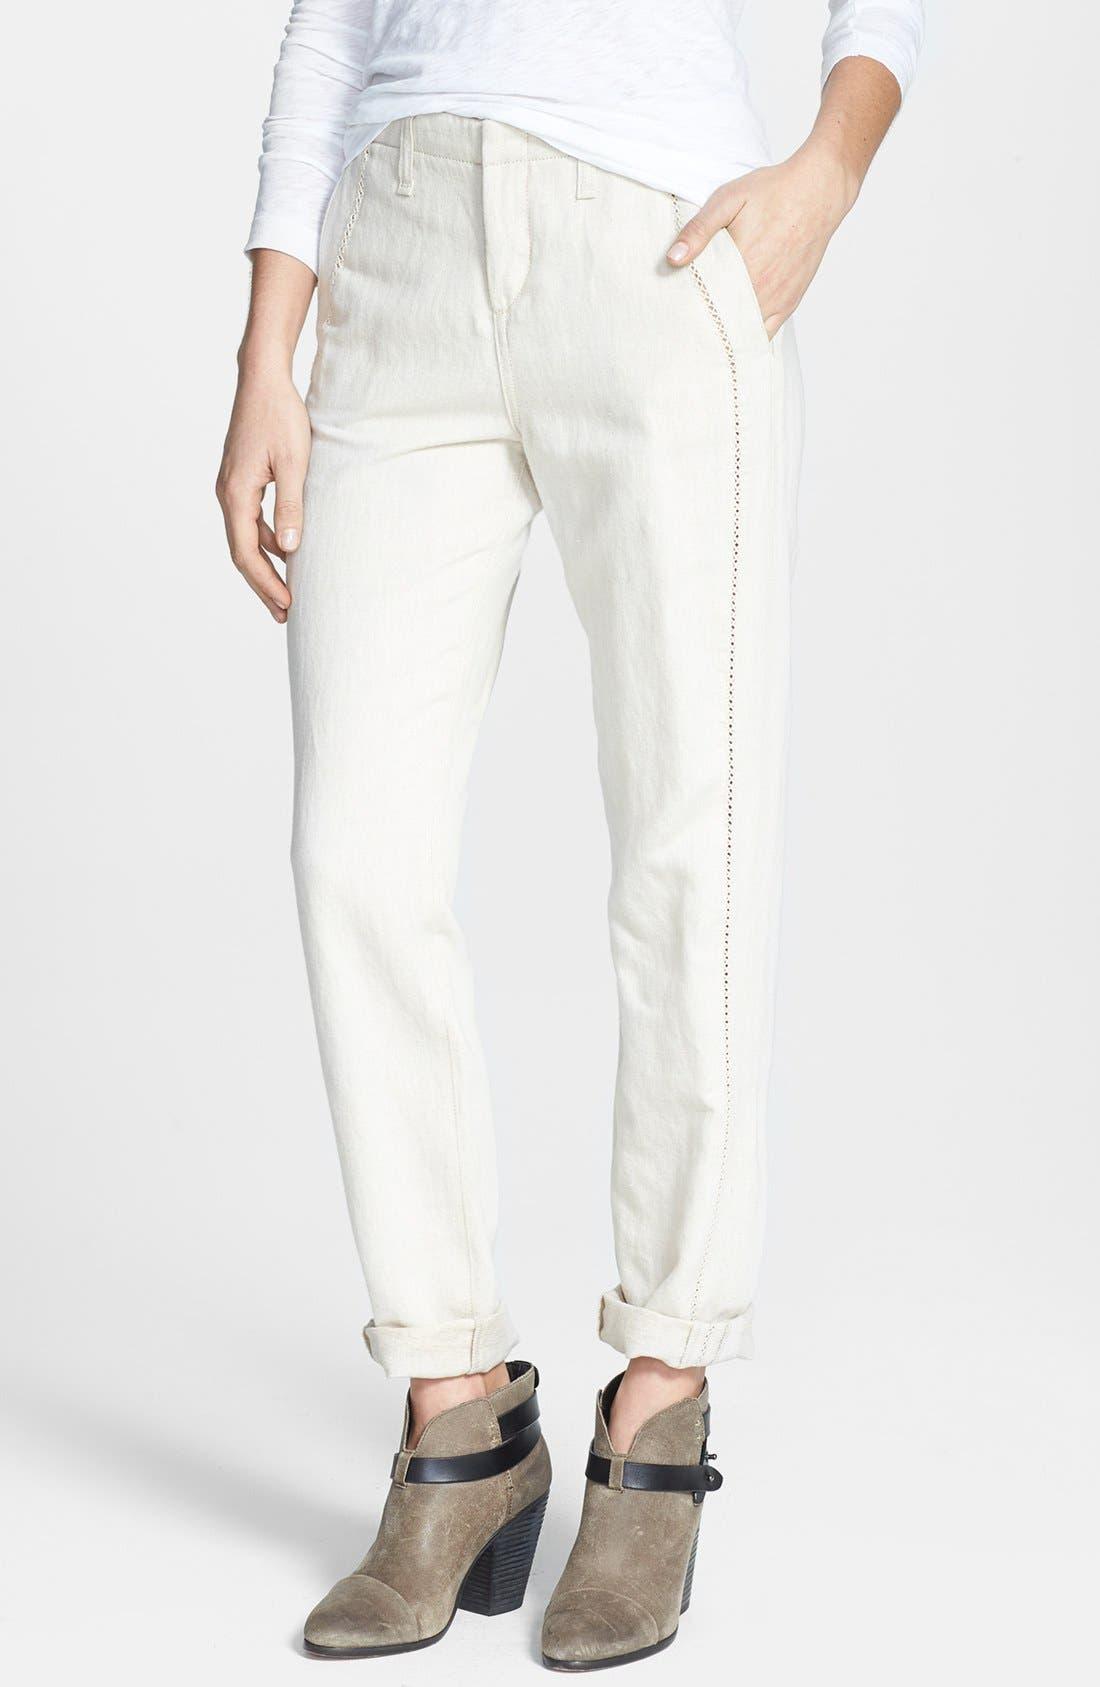 Alternate Image 1 Selected - rag & bone/JEAN 'Separating Portobello' Open Detail Pants